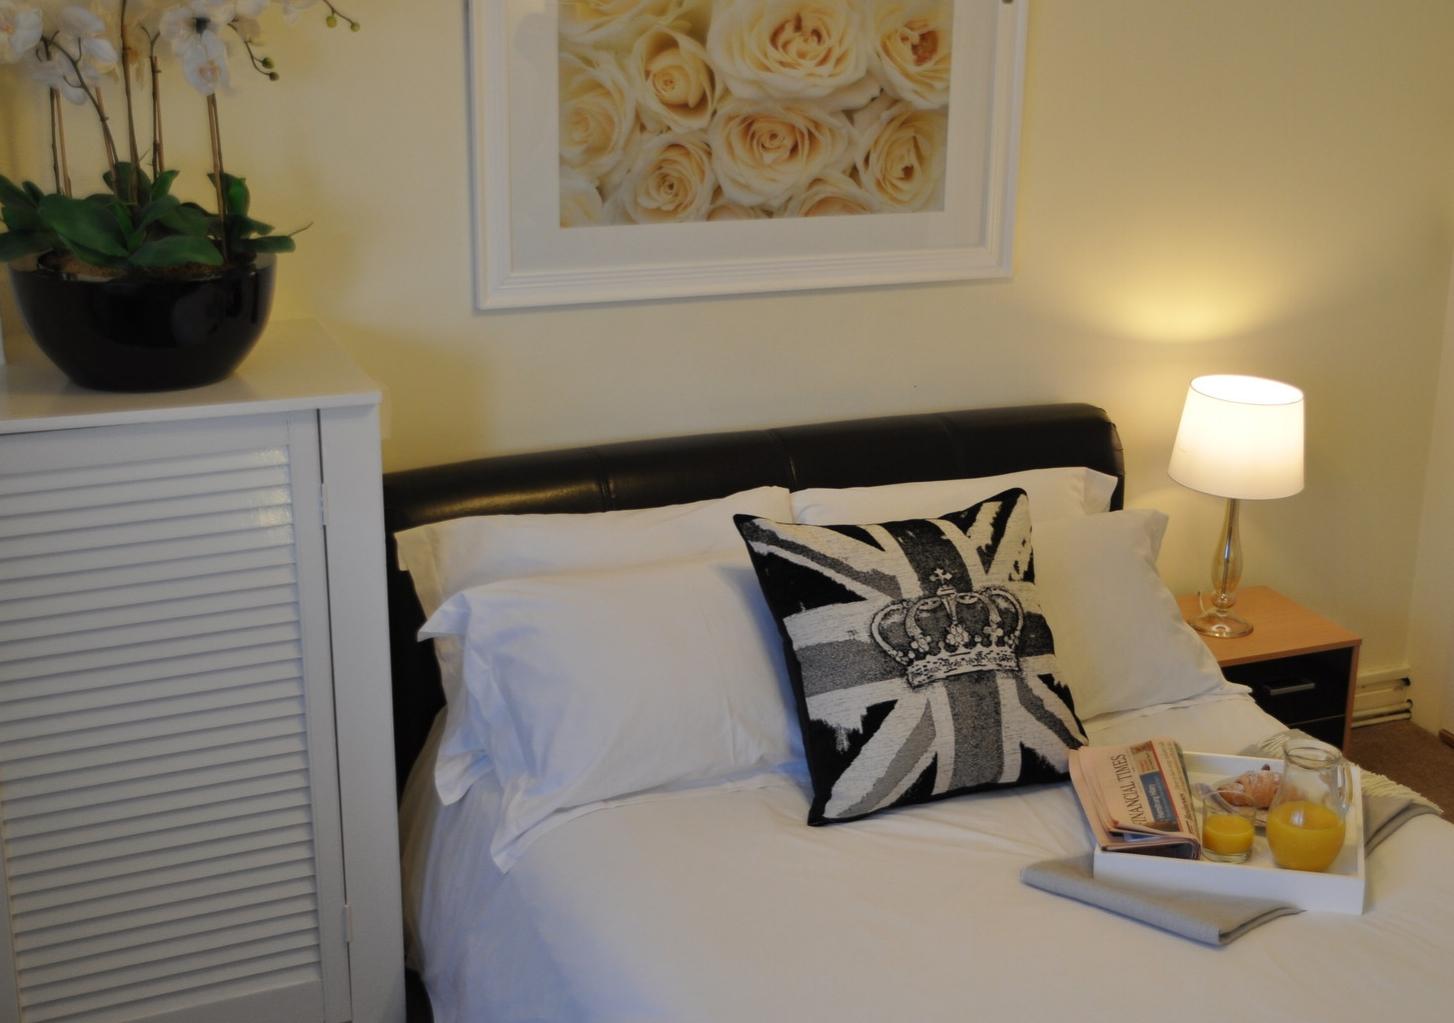 marlyn lodge | short term accommodation whitechapel | lloyds of